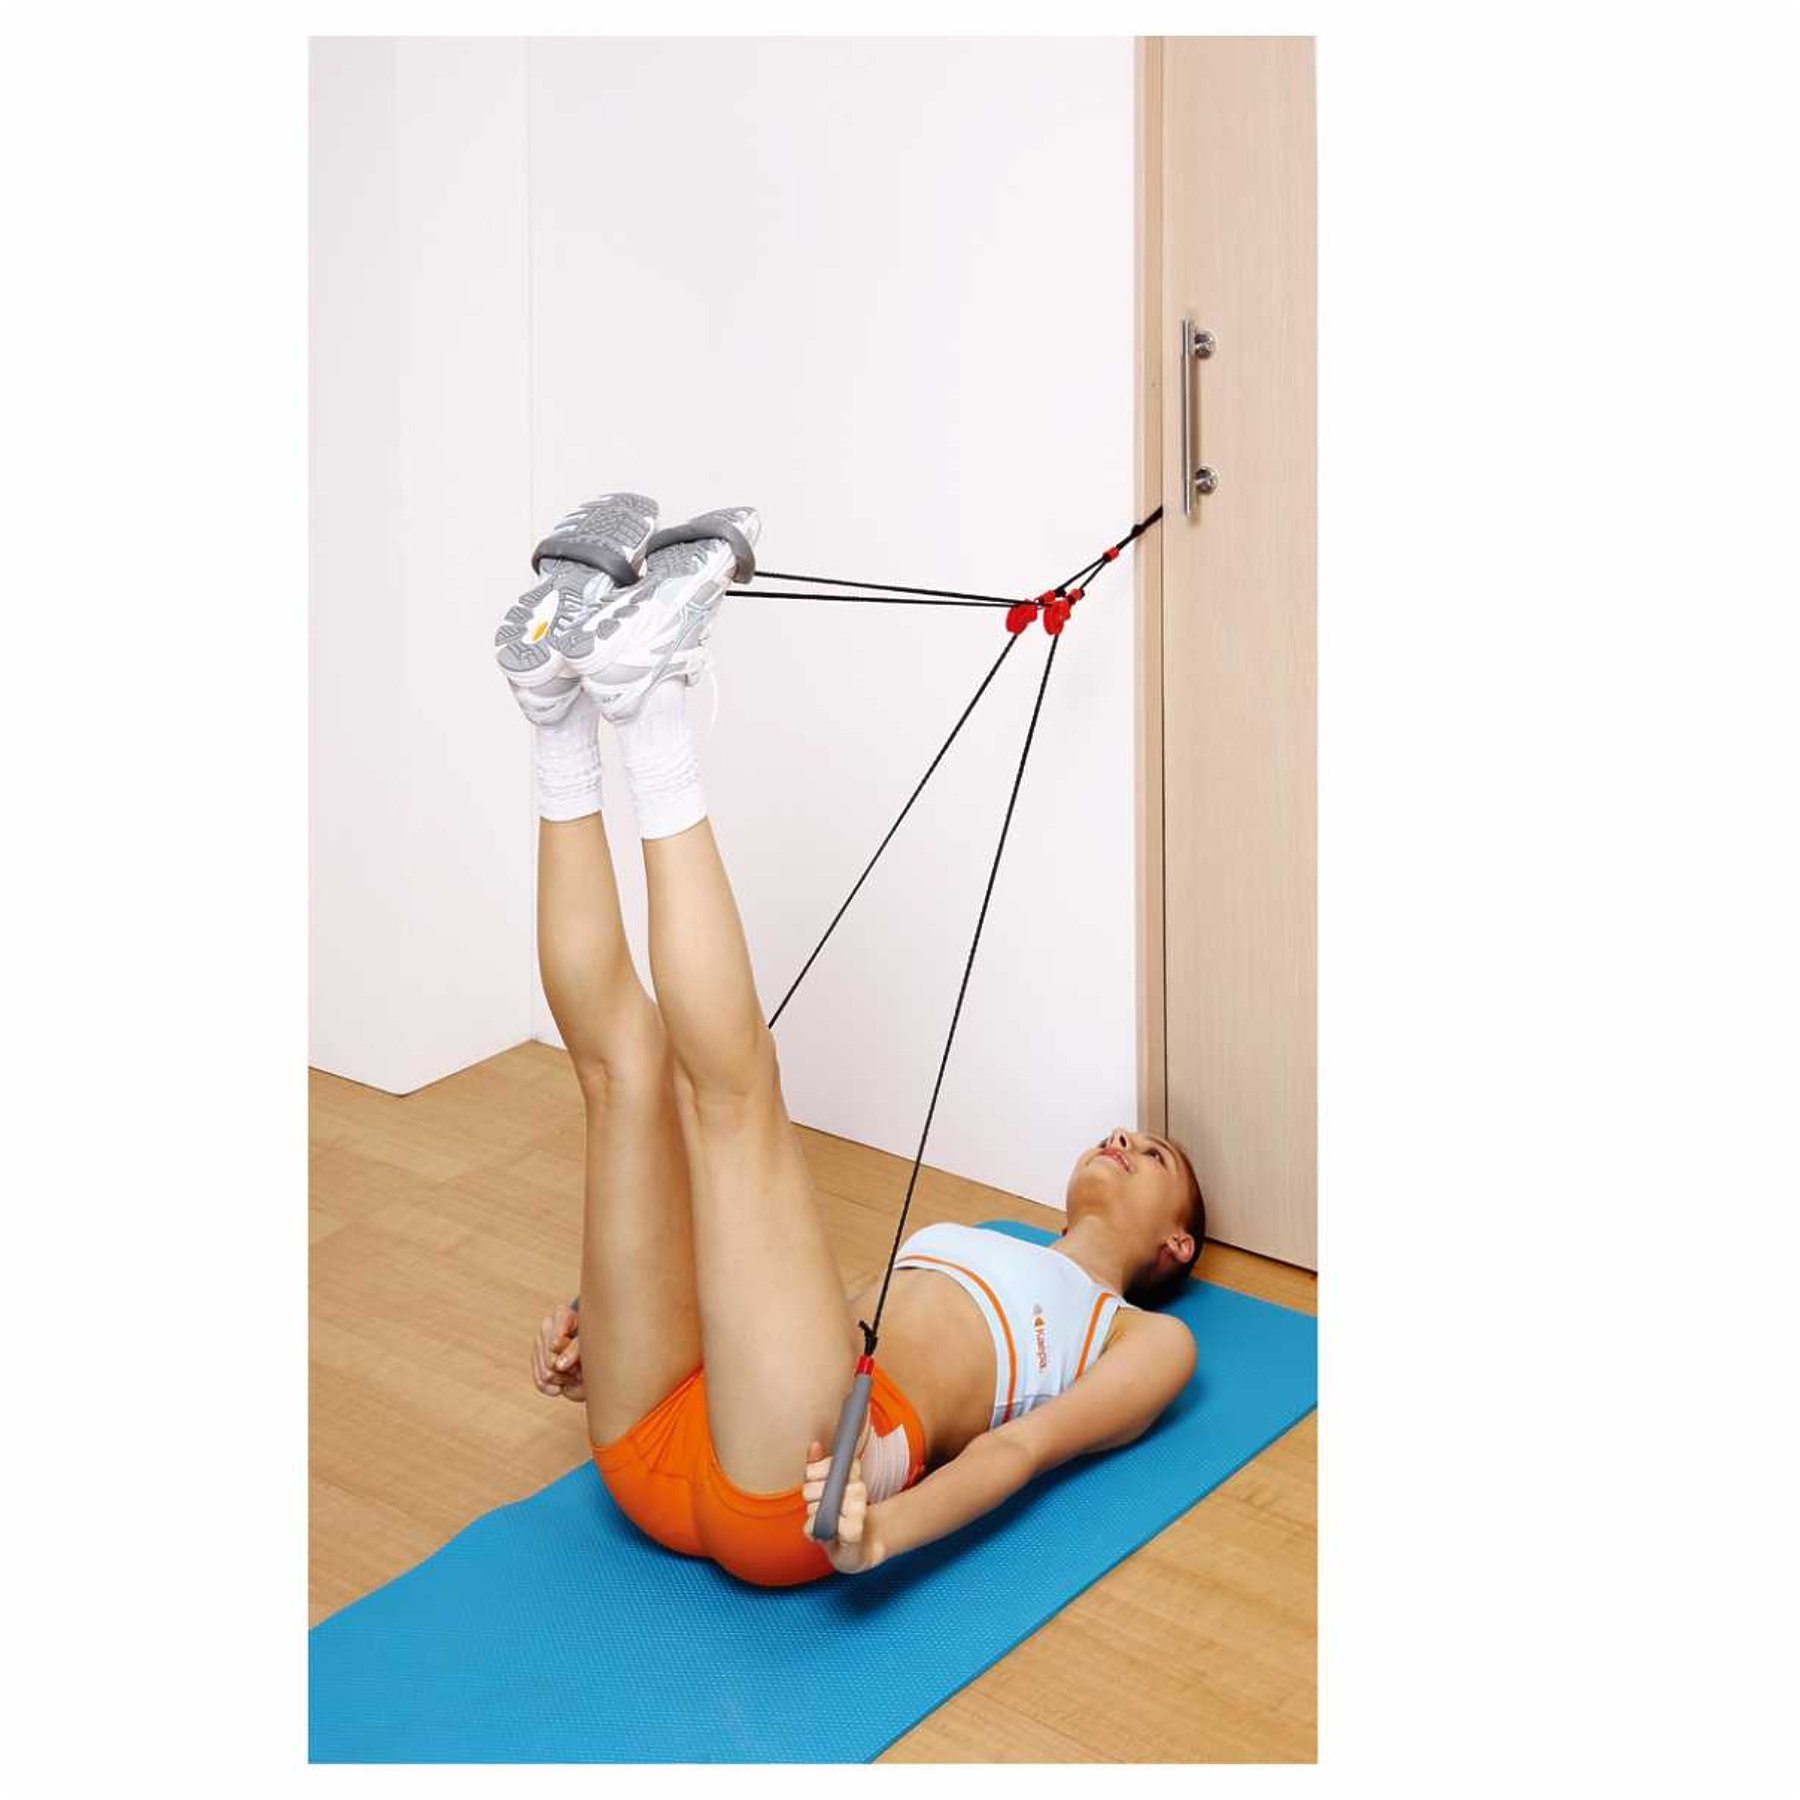 pilates door knob rope exerciser photo - 4